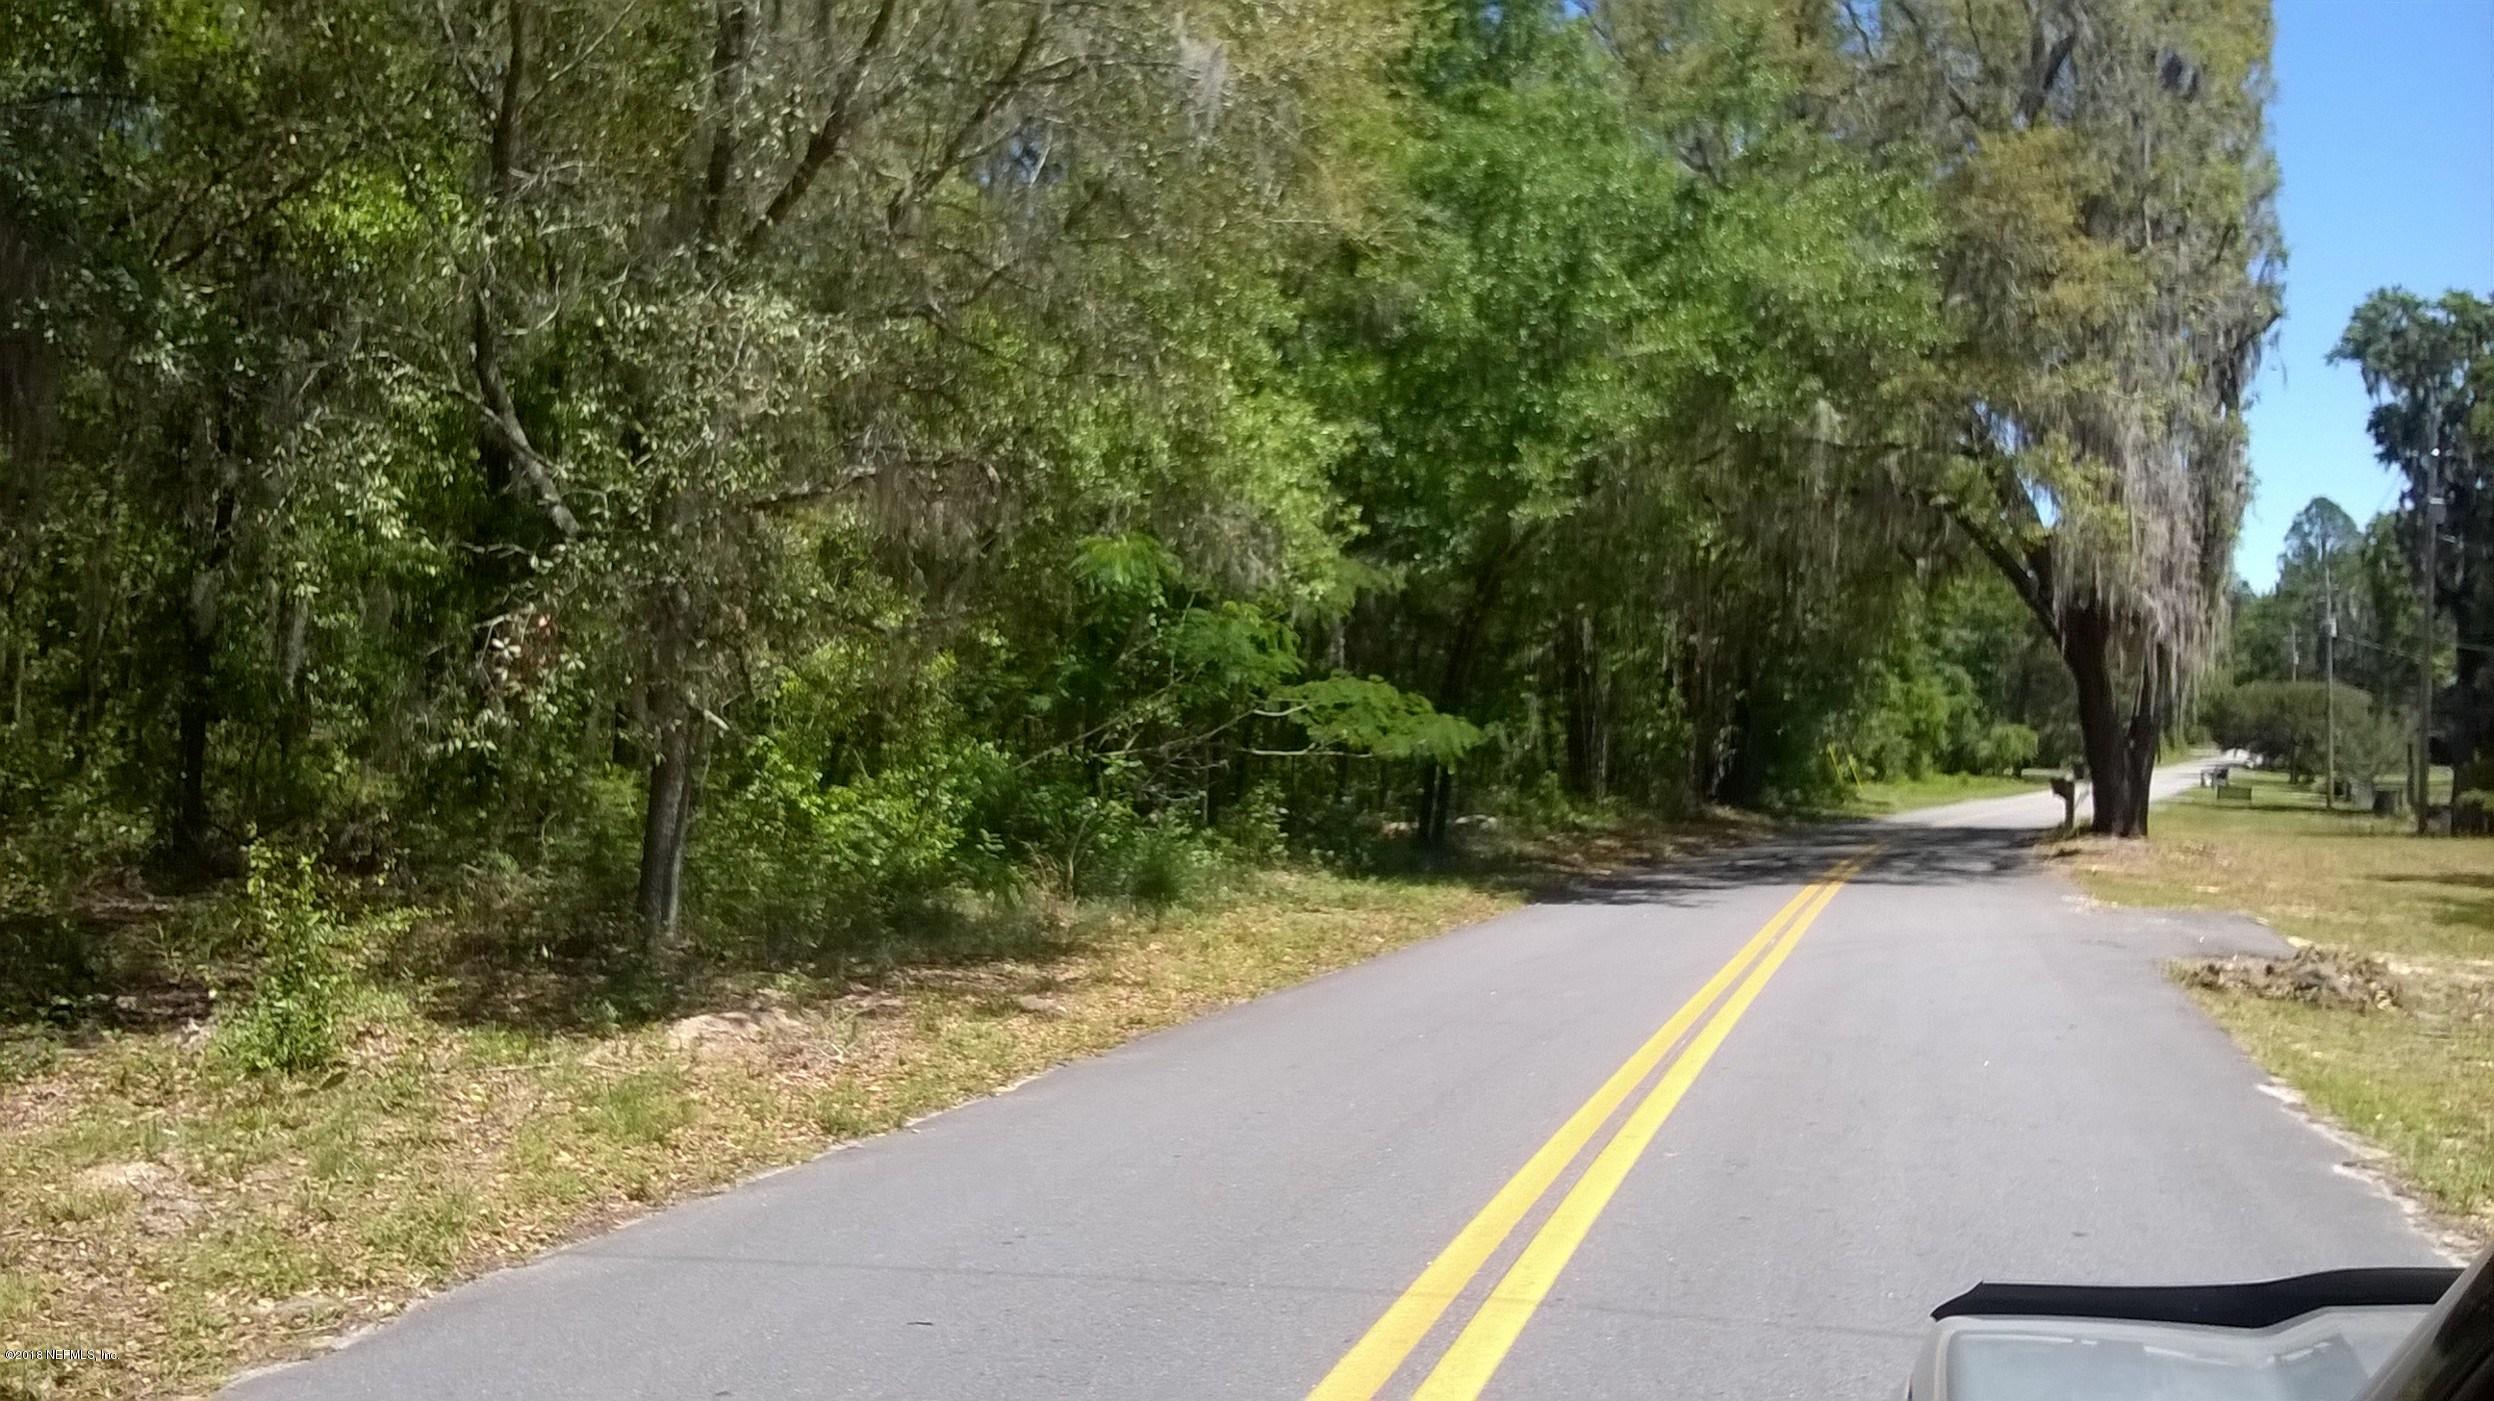 542 HILLSBOROUGH, FLORAHOME, FLORIDA 32140, ,Vacant land,For sale,HILLSBOROUGH,932301